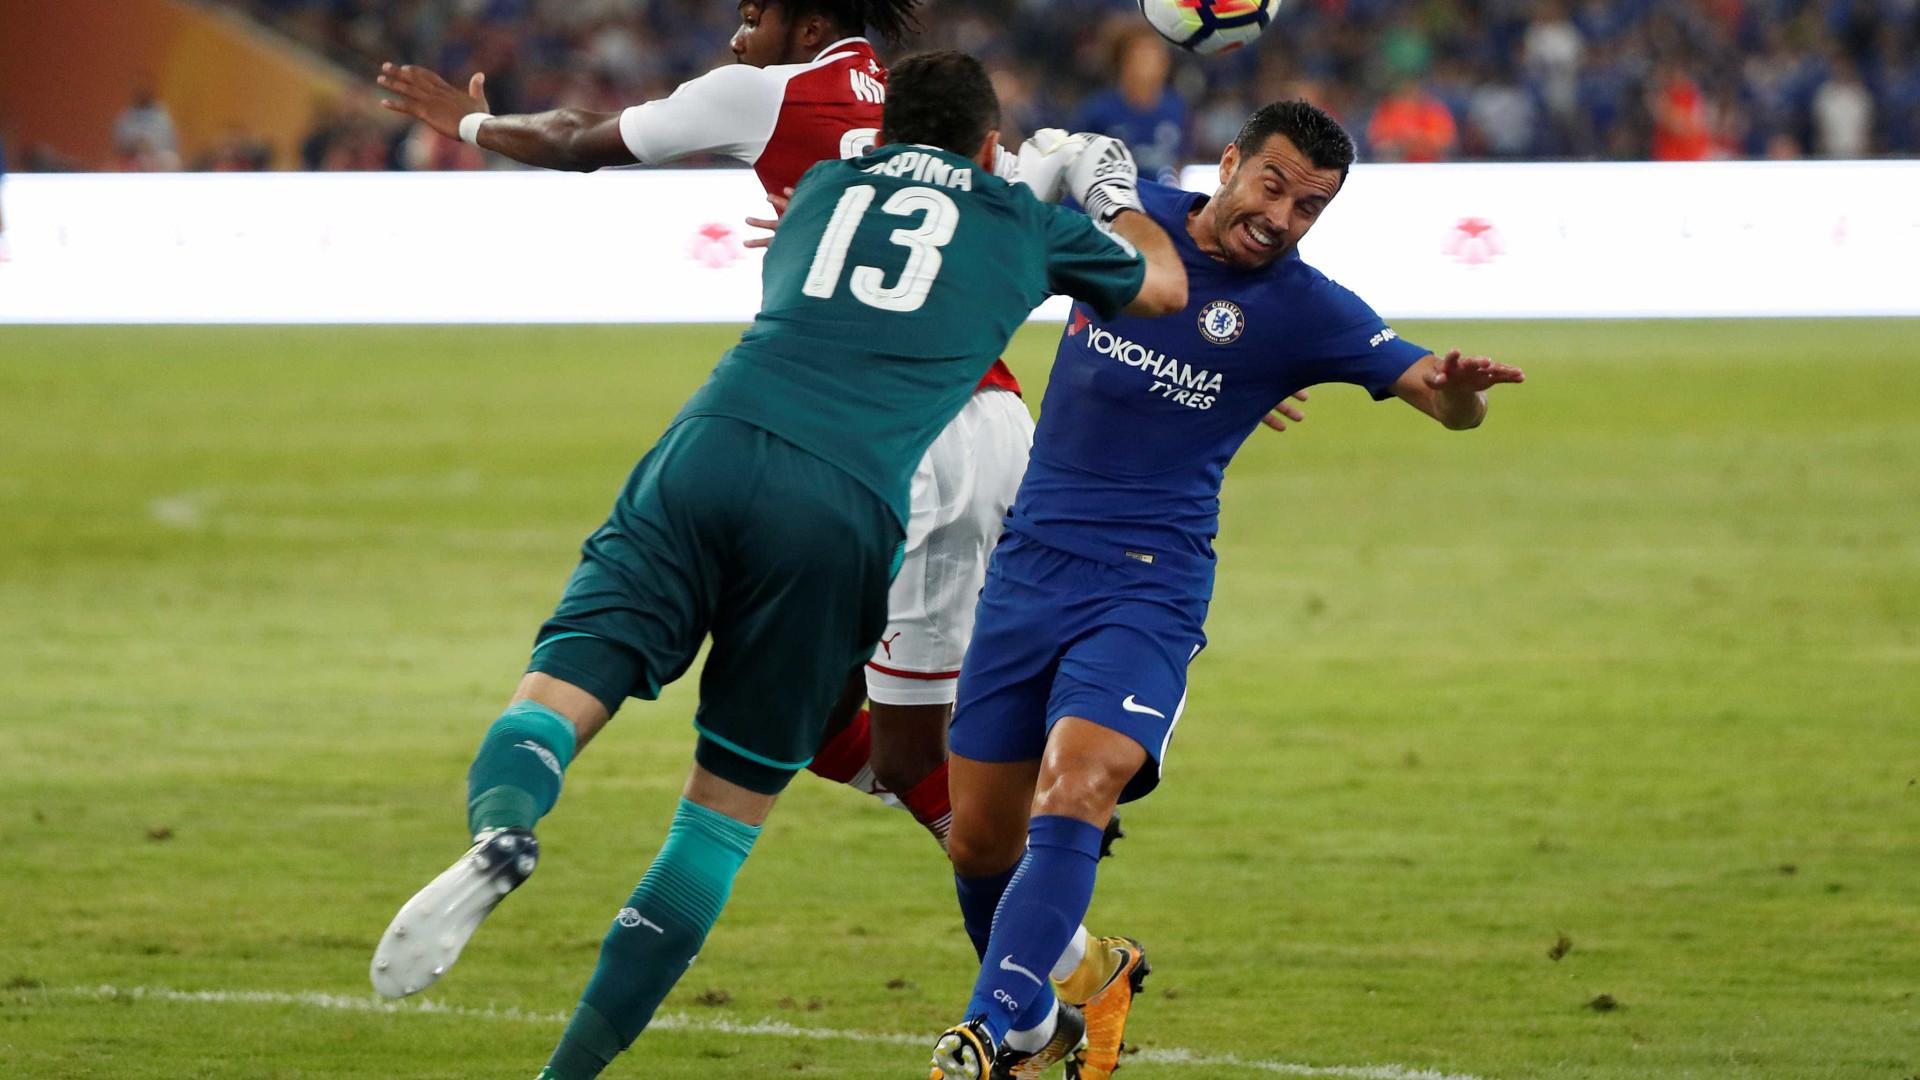 Chelsea vence Arsenal, com bis de Batshuayi